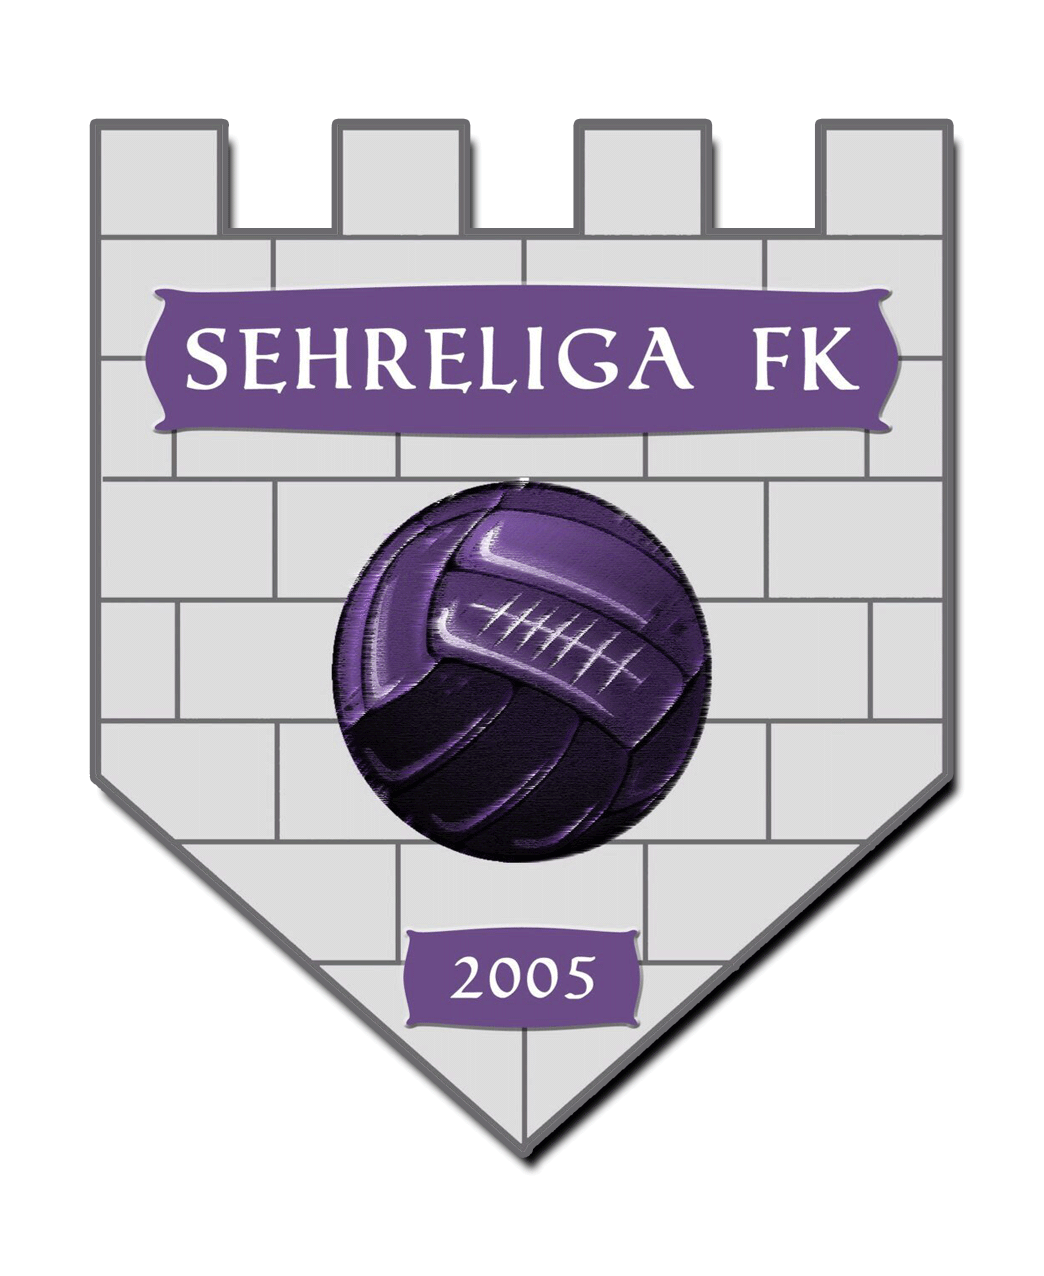 Şehreliga FK